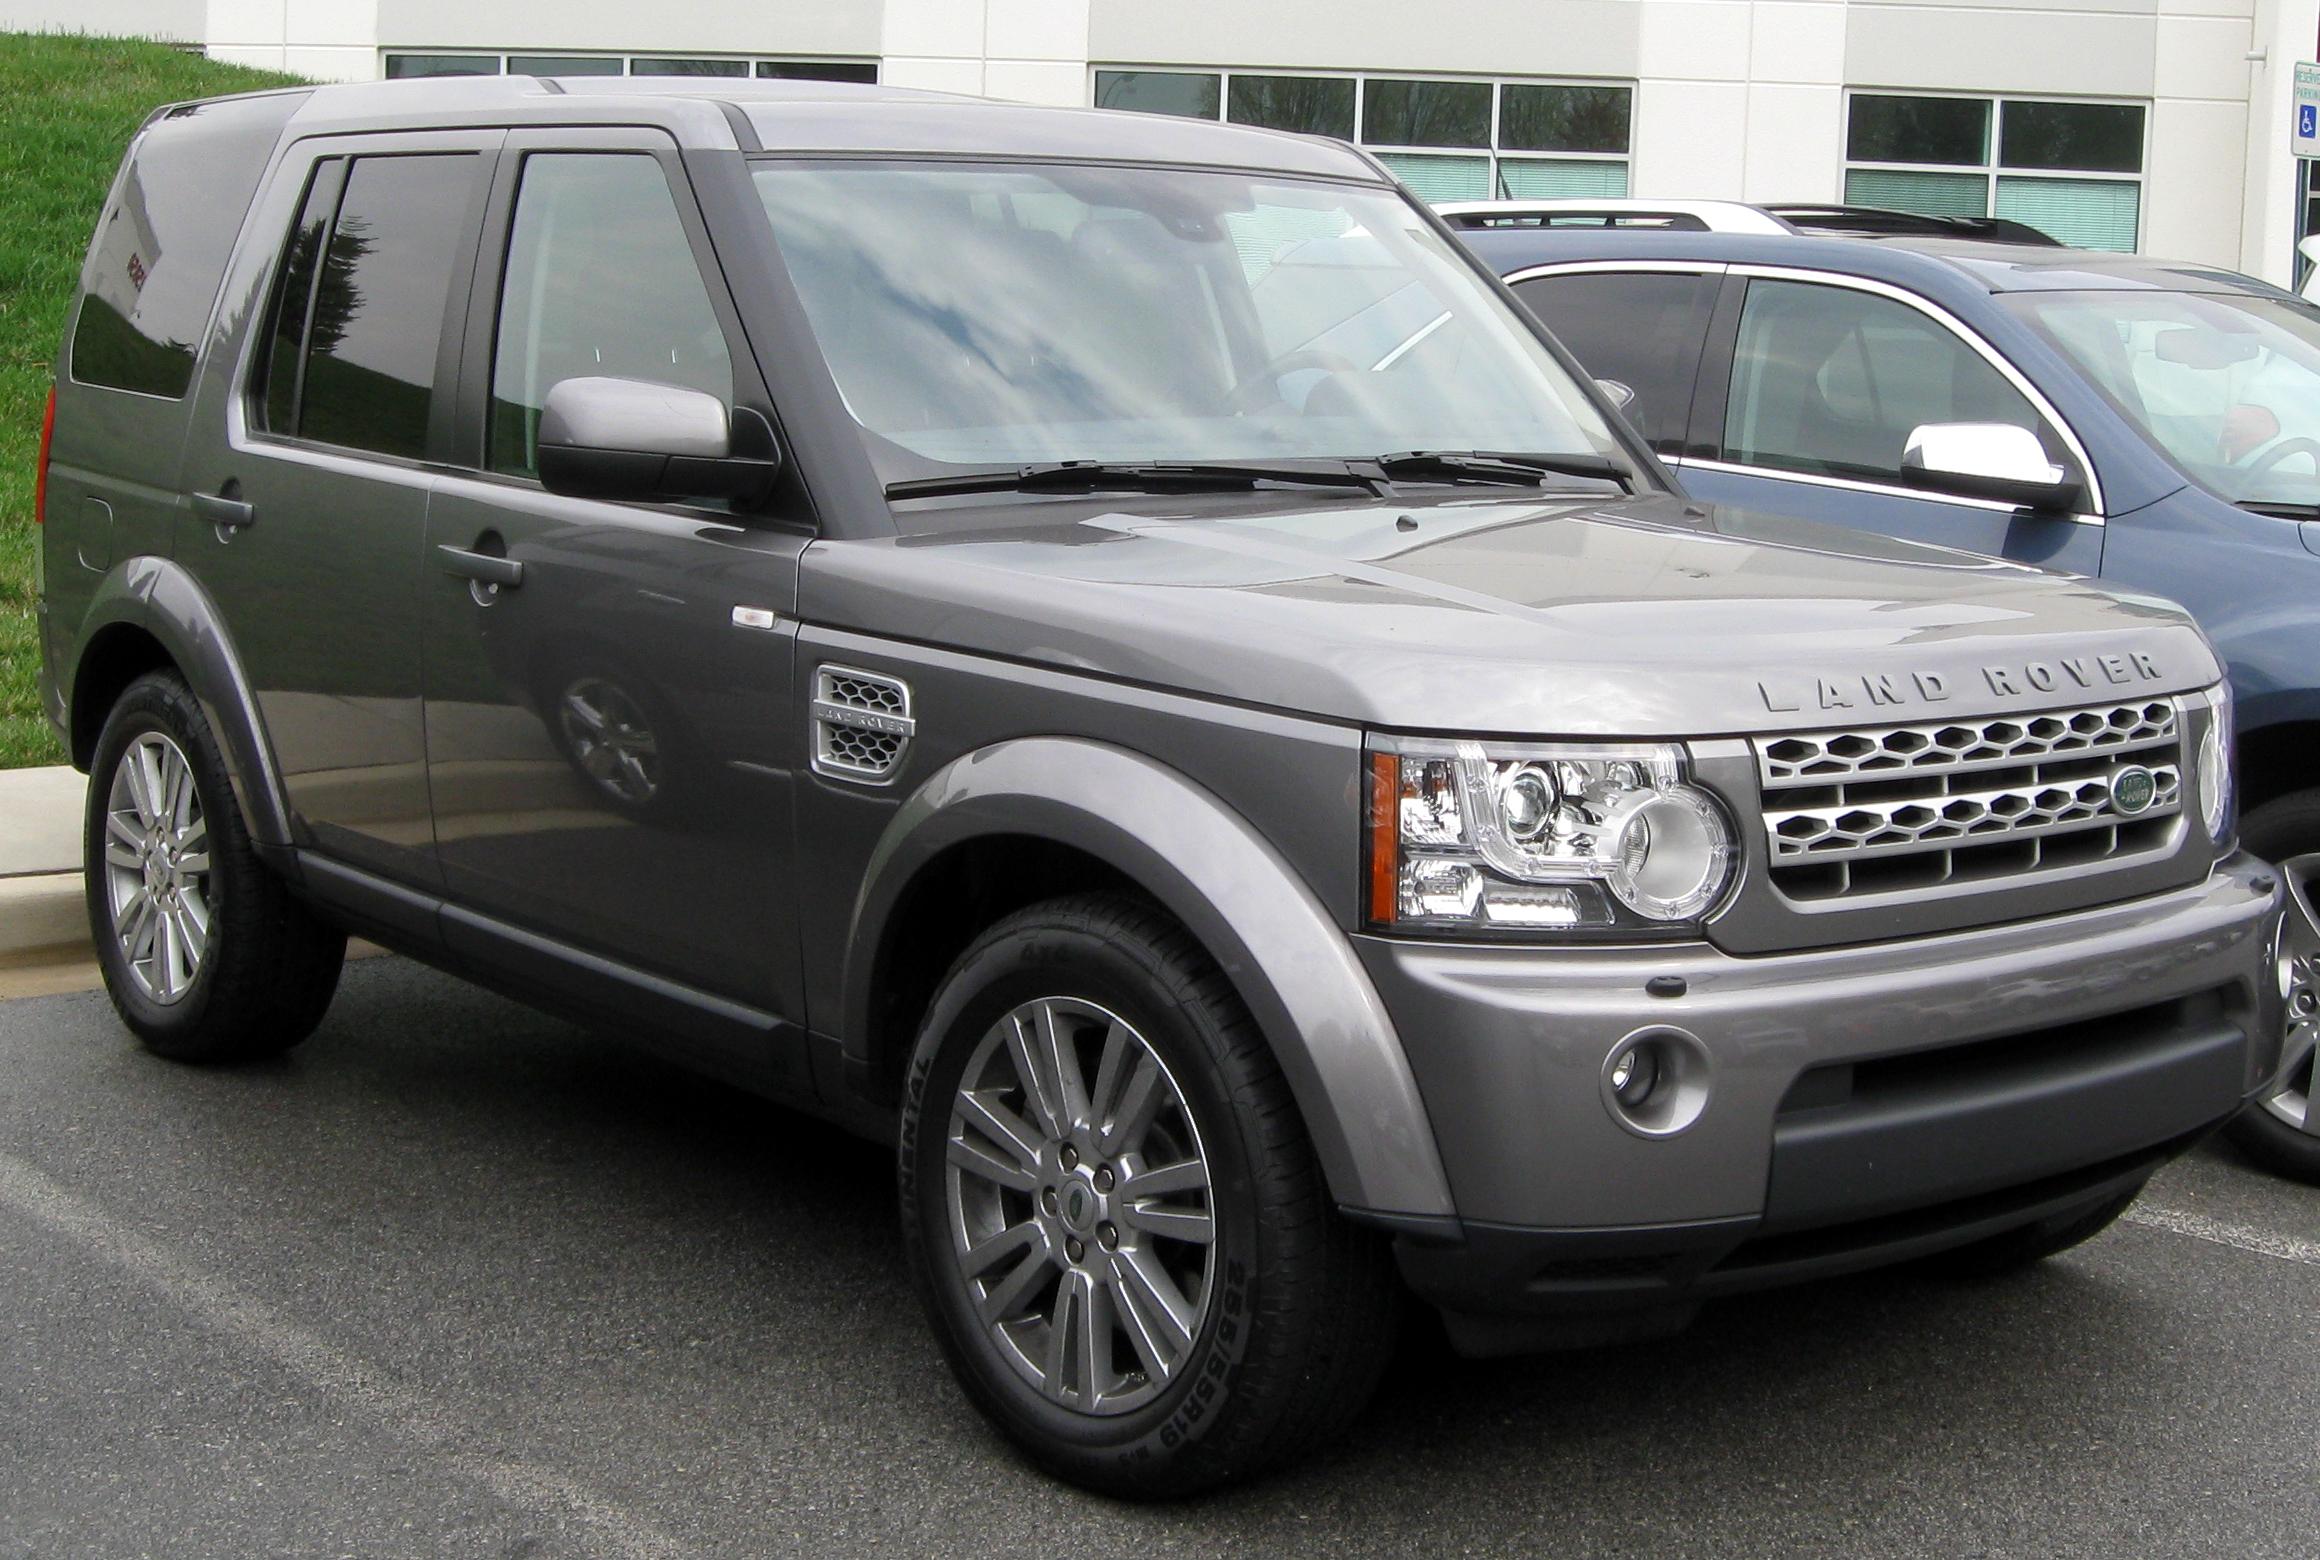 Land Rover LR4 2011